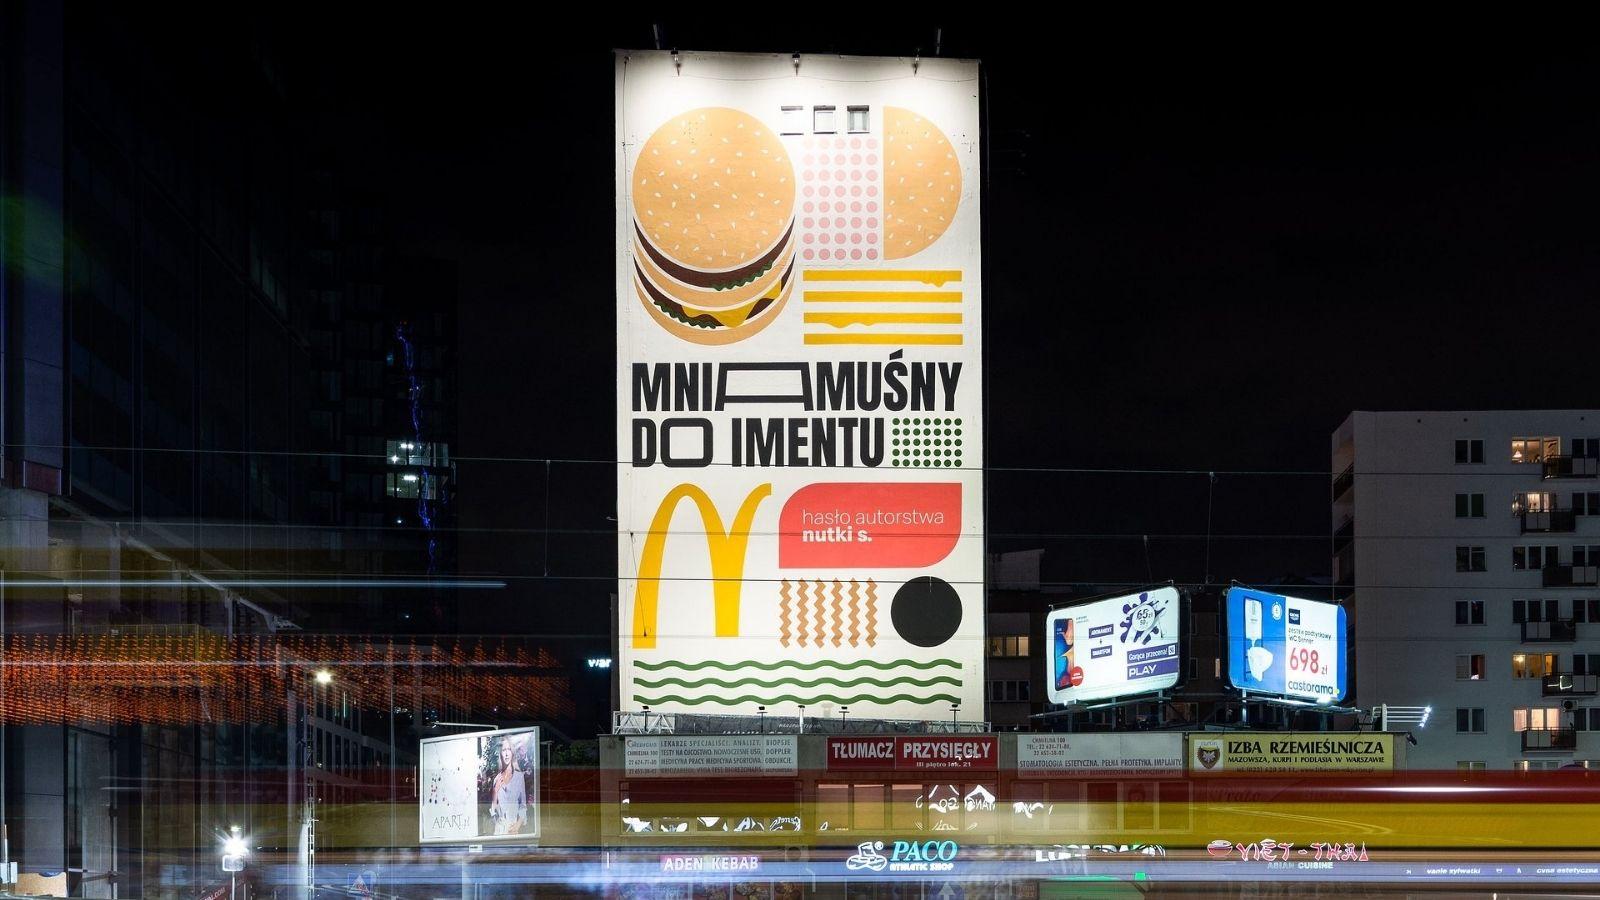 Zaskakujący mural McDonald's w stolicy! McDonald's mediarun mural mcdonalds